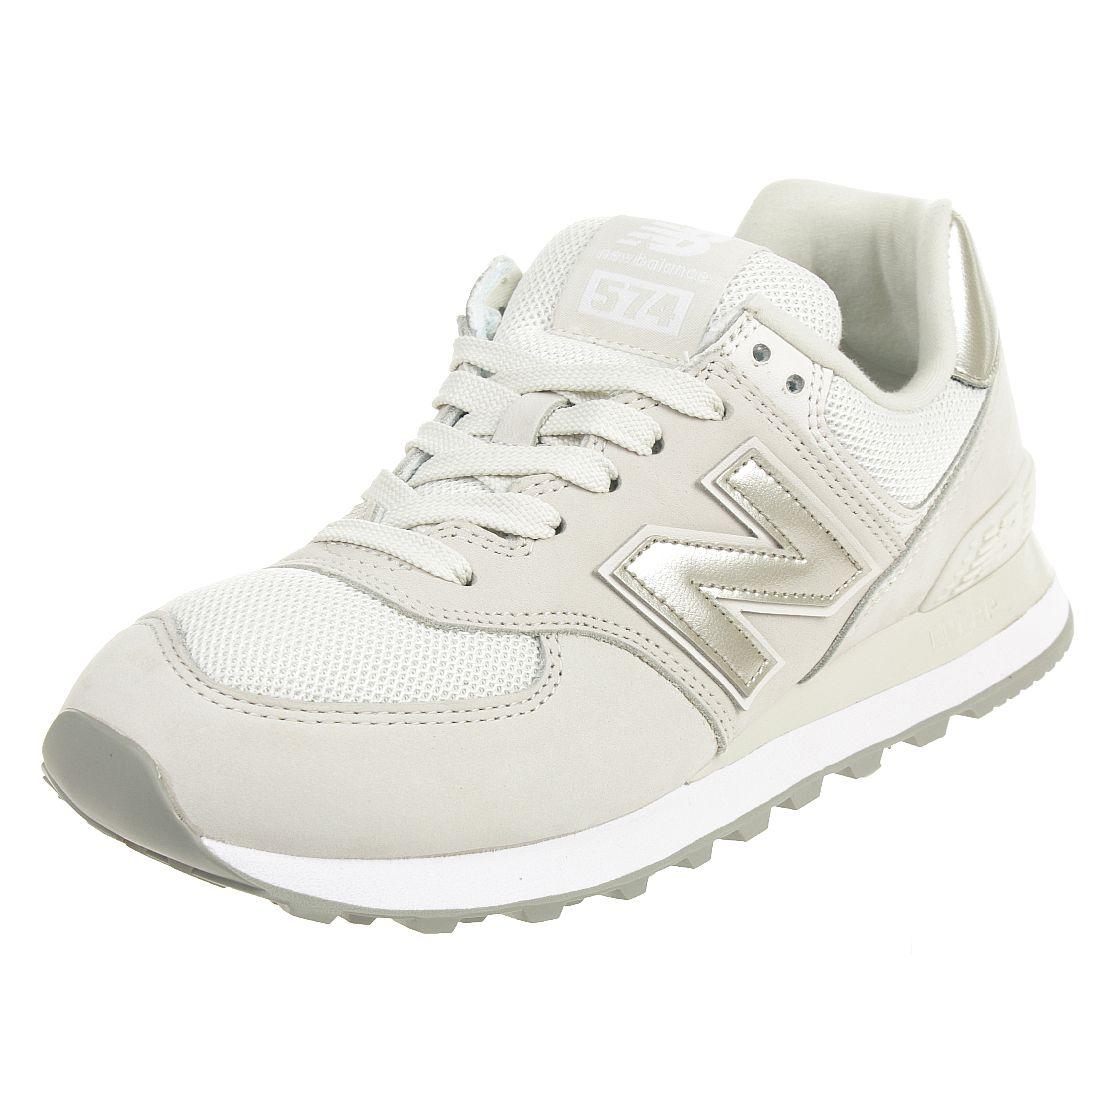 New Balance WL574 WNO Classic Sneaker Damen Schuhe grau ...